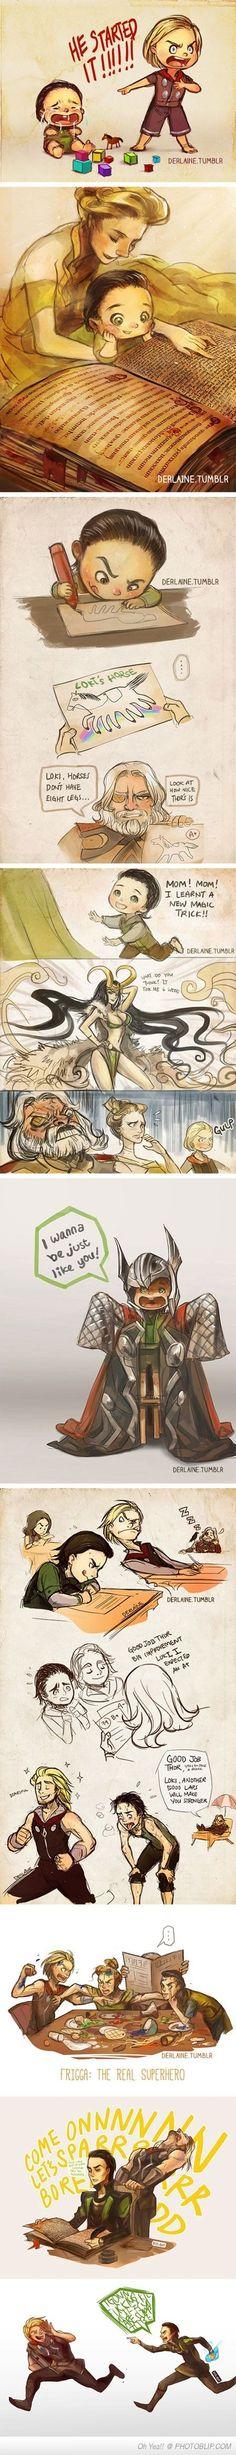 Thor and Loki growing up